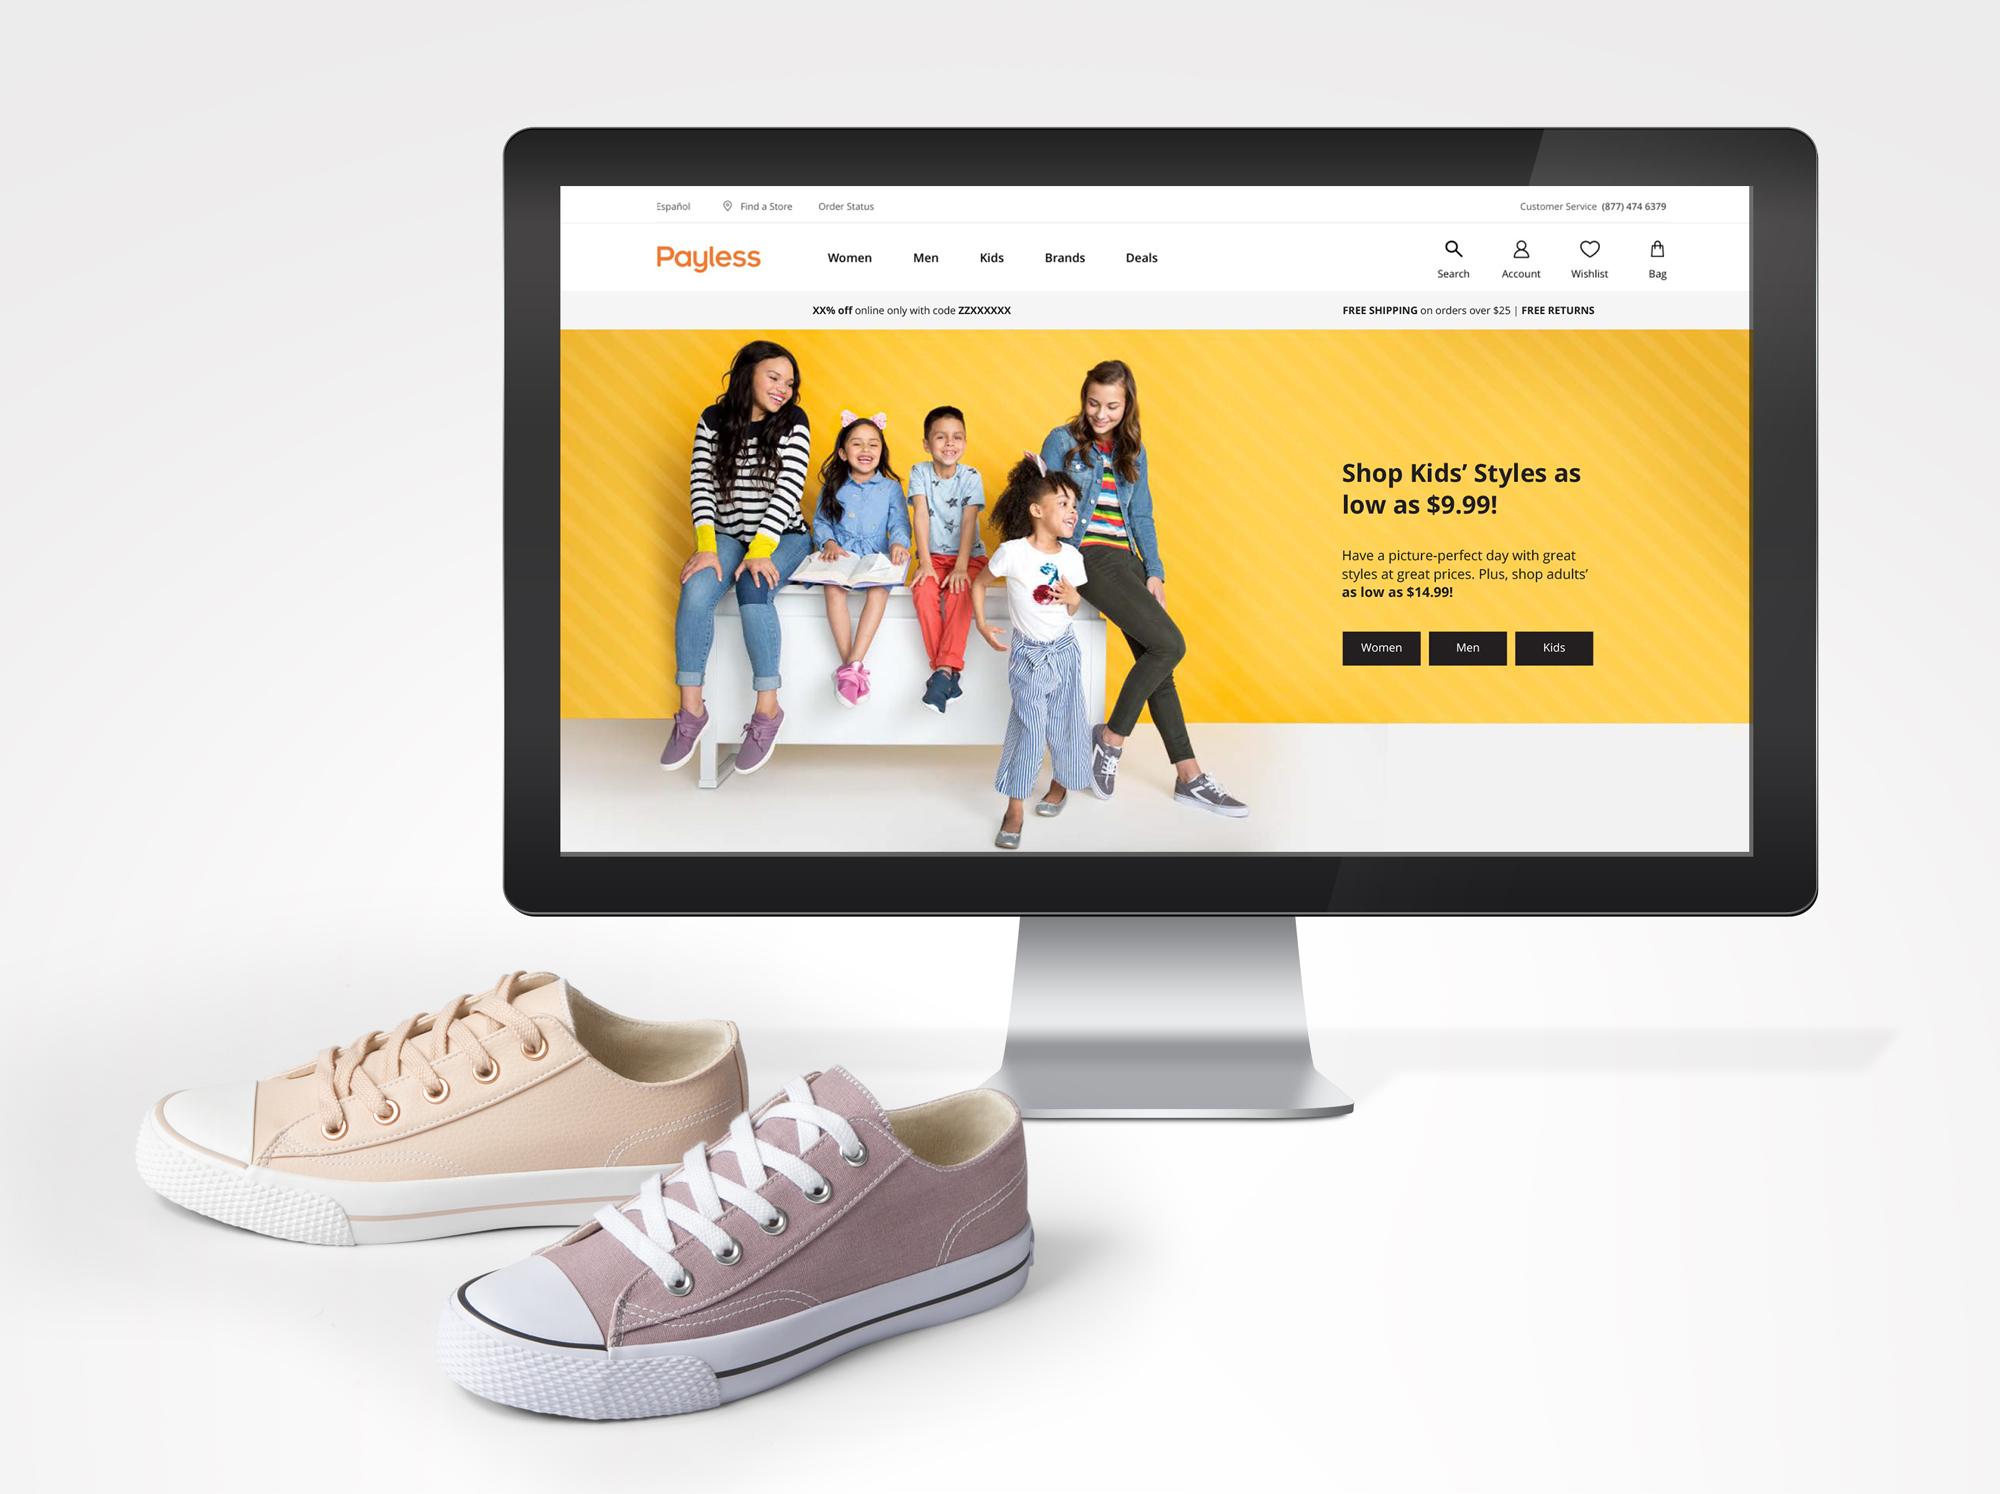 Payless_Website-New-Template-Shoes.jpg